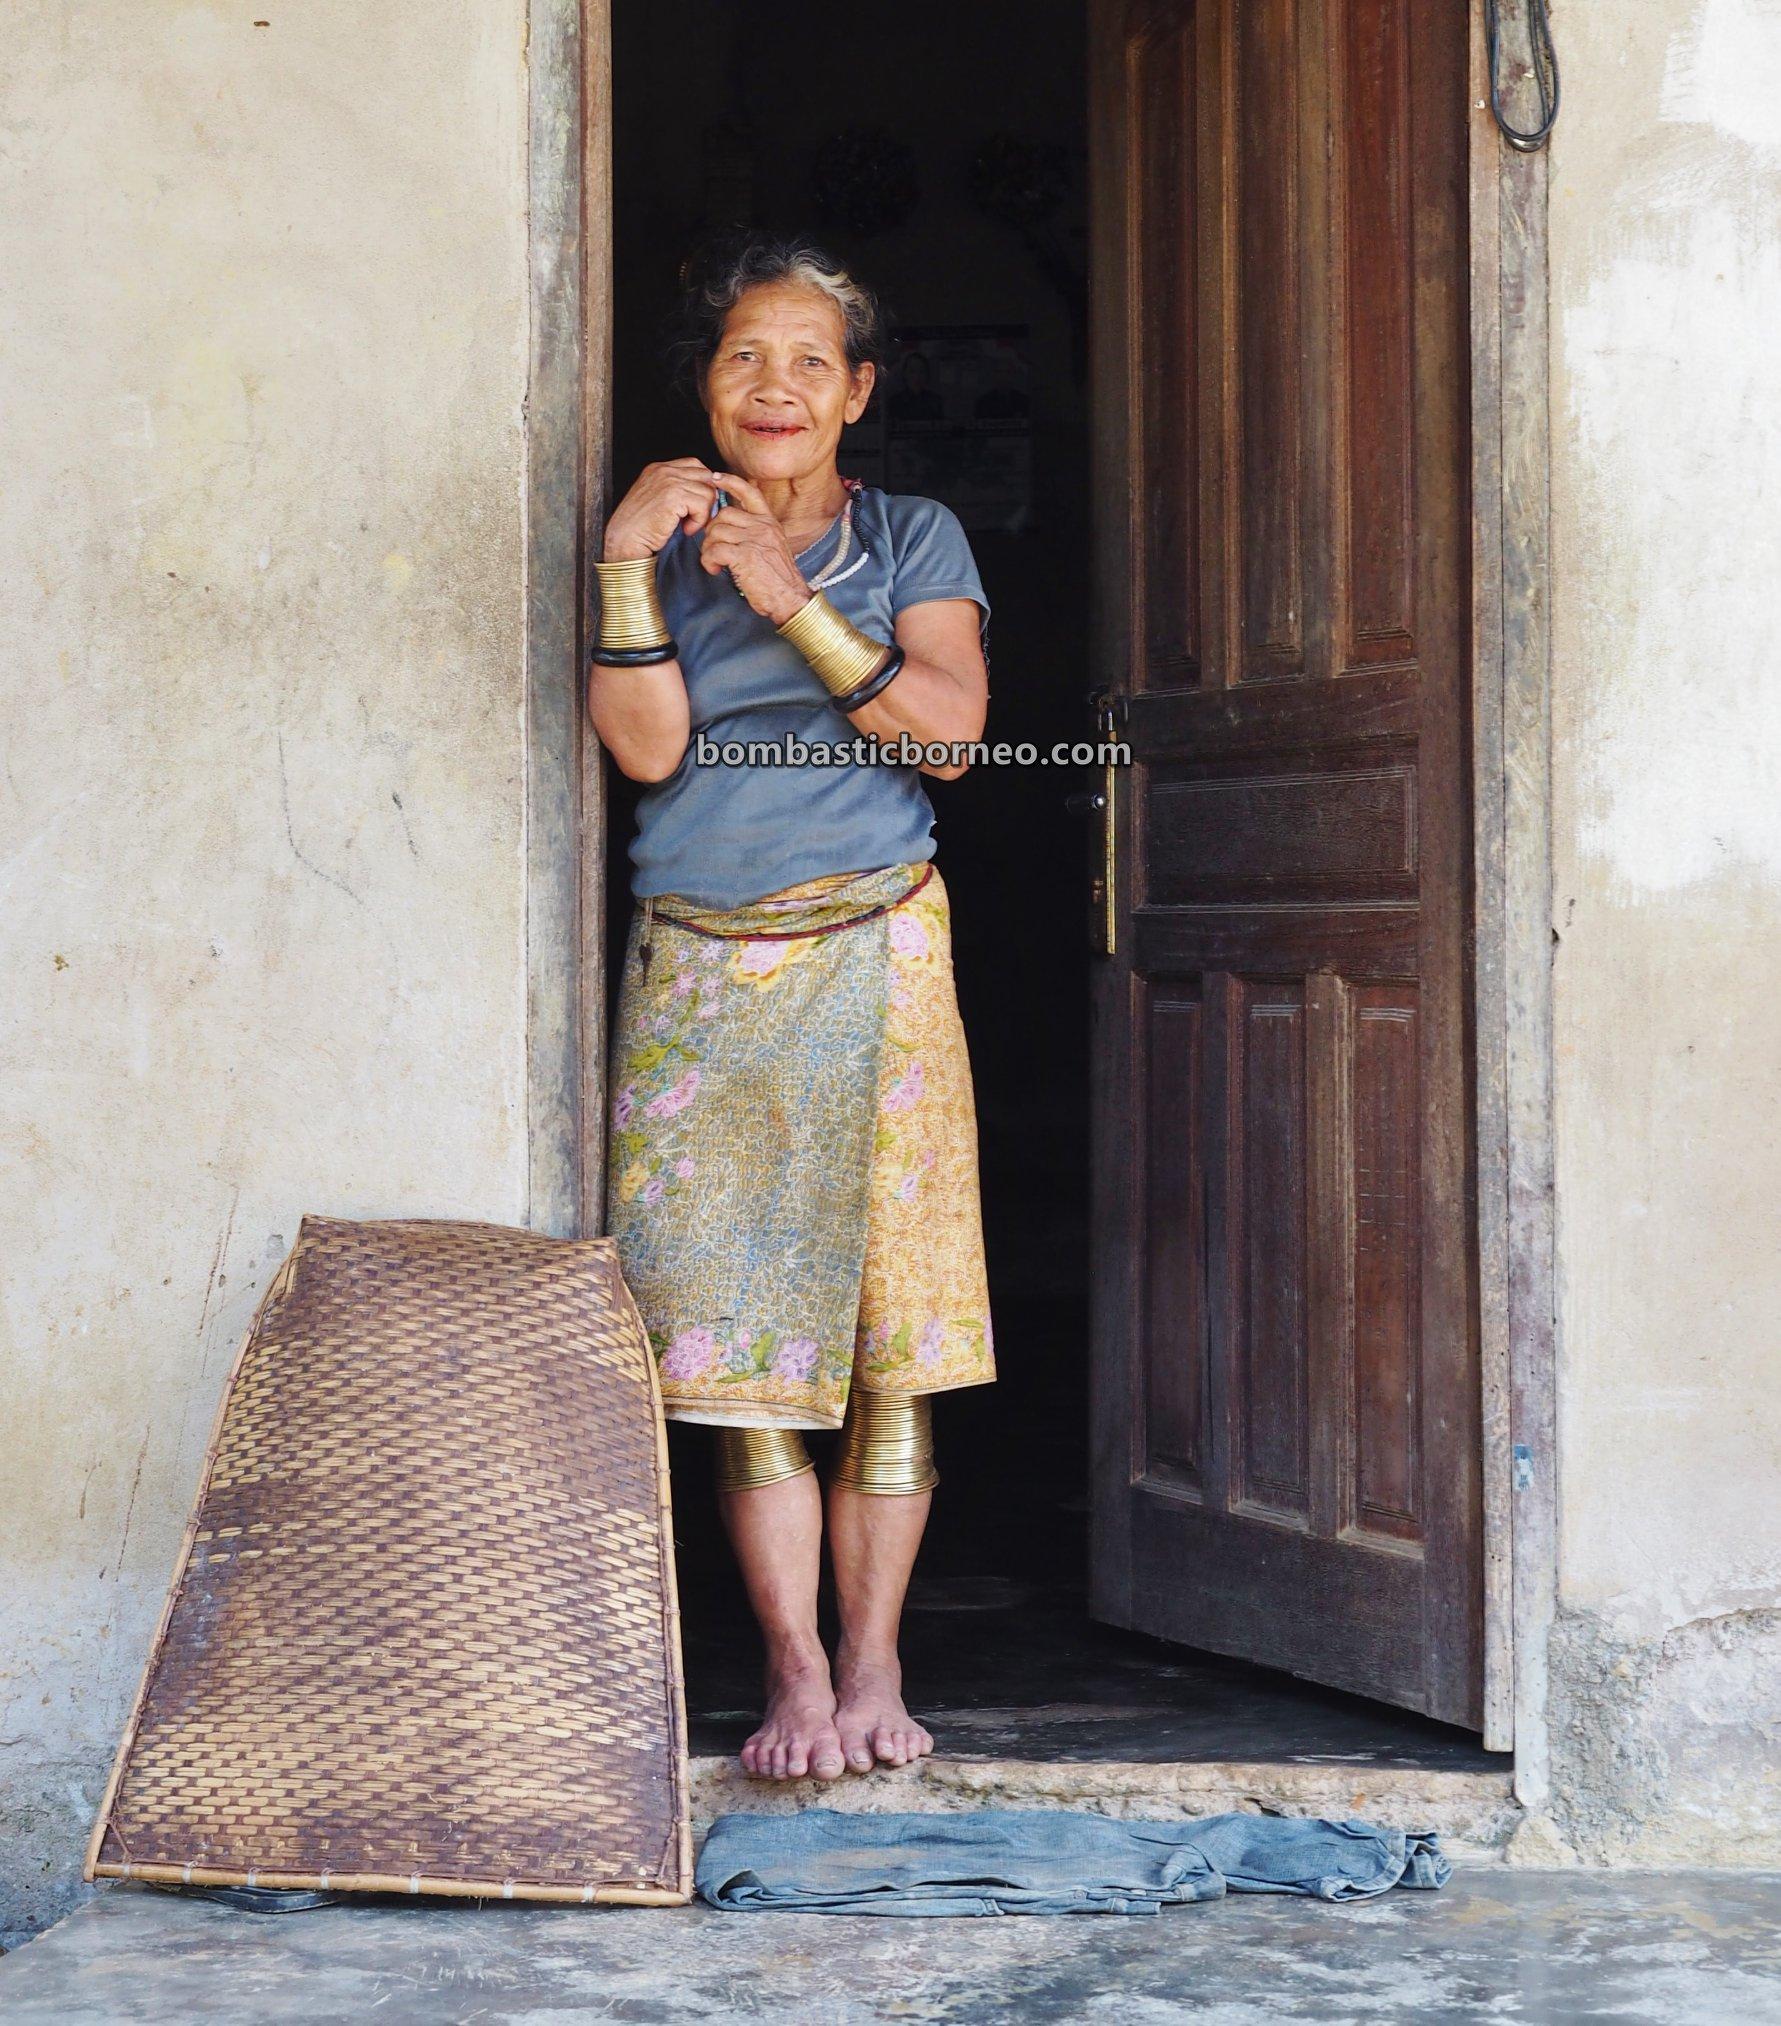 Tembaga Gelang, Dusun Medeng, authentic, traditional, backpackers, Bengkayang, Kalimantan Barat, native, Dayak Bidayuh, tourist attraction, Travel guide, Trans Borneo, 穿越婆罗洲达雅, 印尼西加里曼丹, 宋宫比达友族铜环女